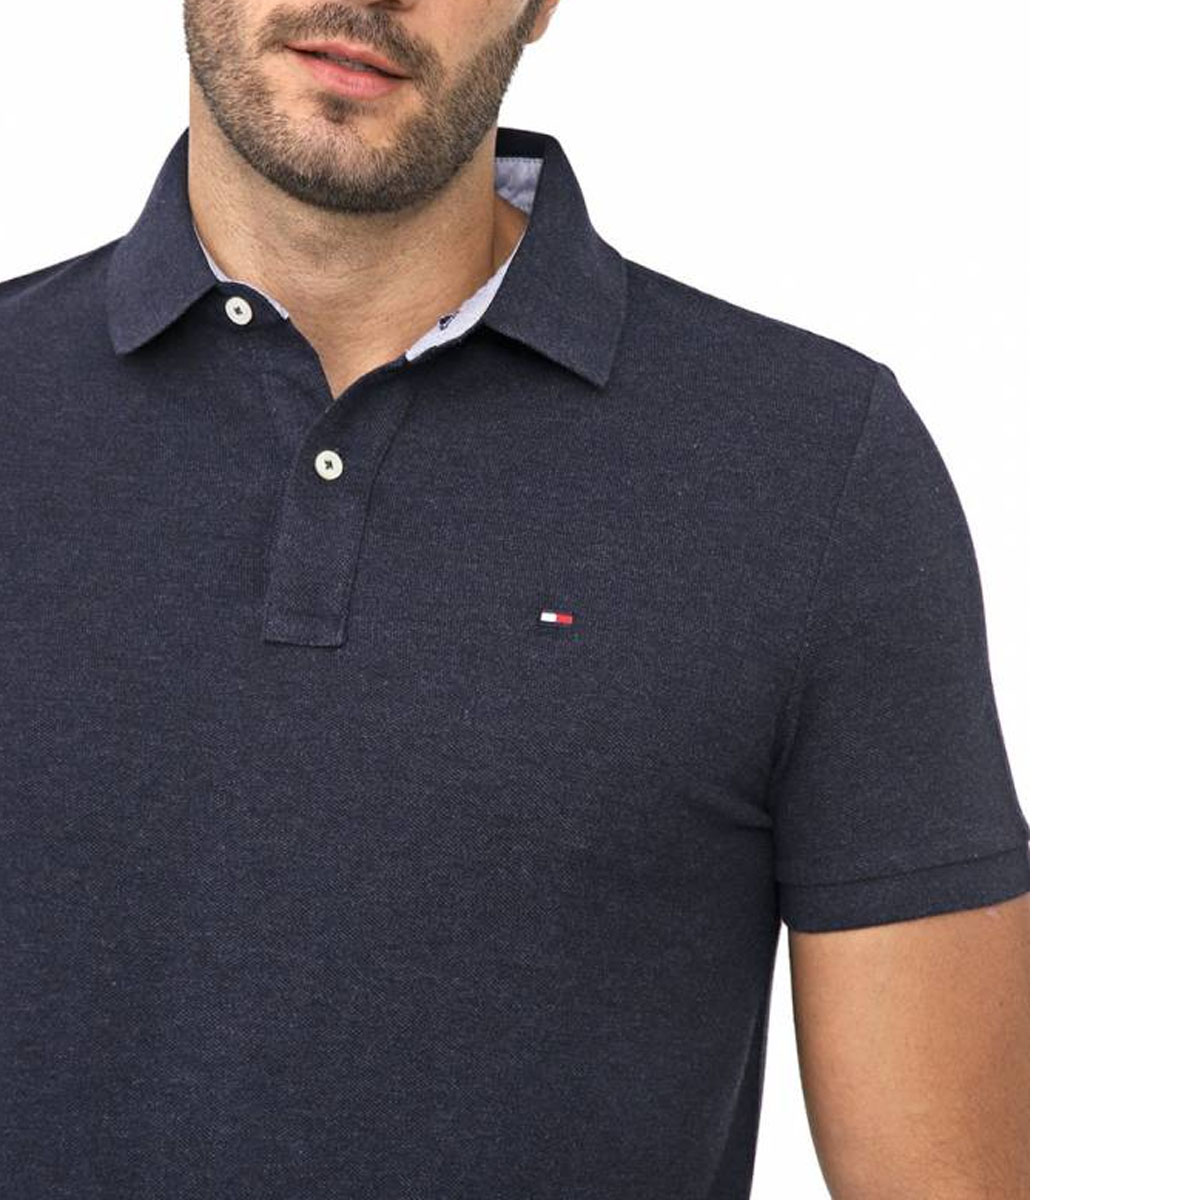 Camisa Polo Tommy Hilfiger Regular Azul Marinho Mescla